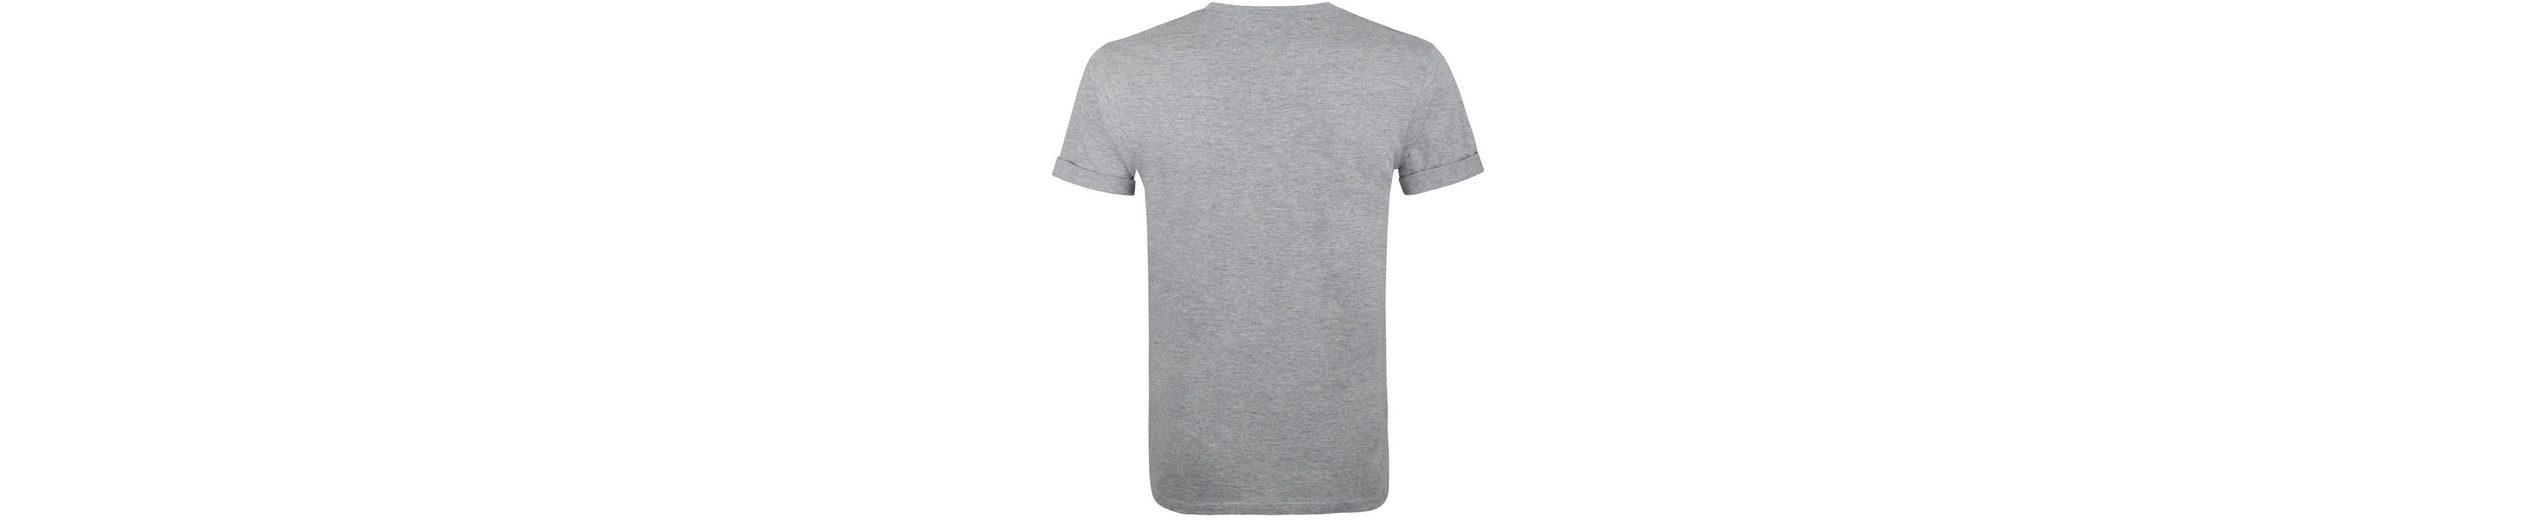 SOULSTAR T-Shirt Billig Verkauf Echt Verkauf Bestseller Günstig Kaufen Websites Jx5eb